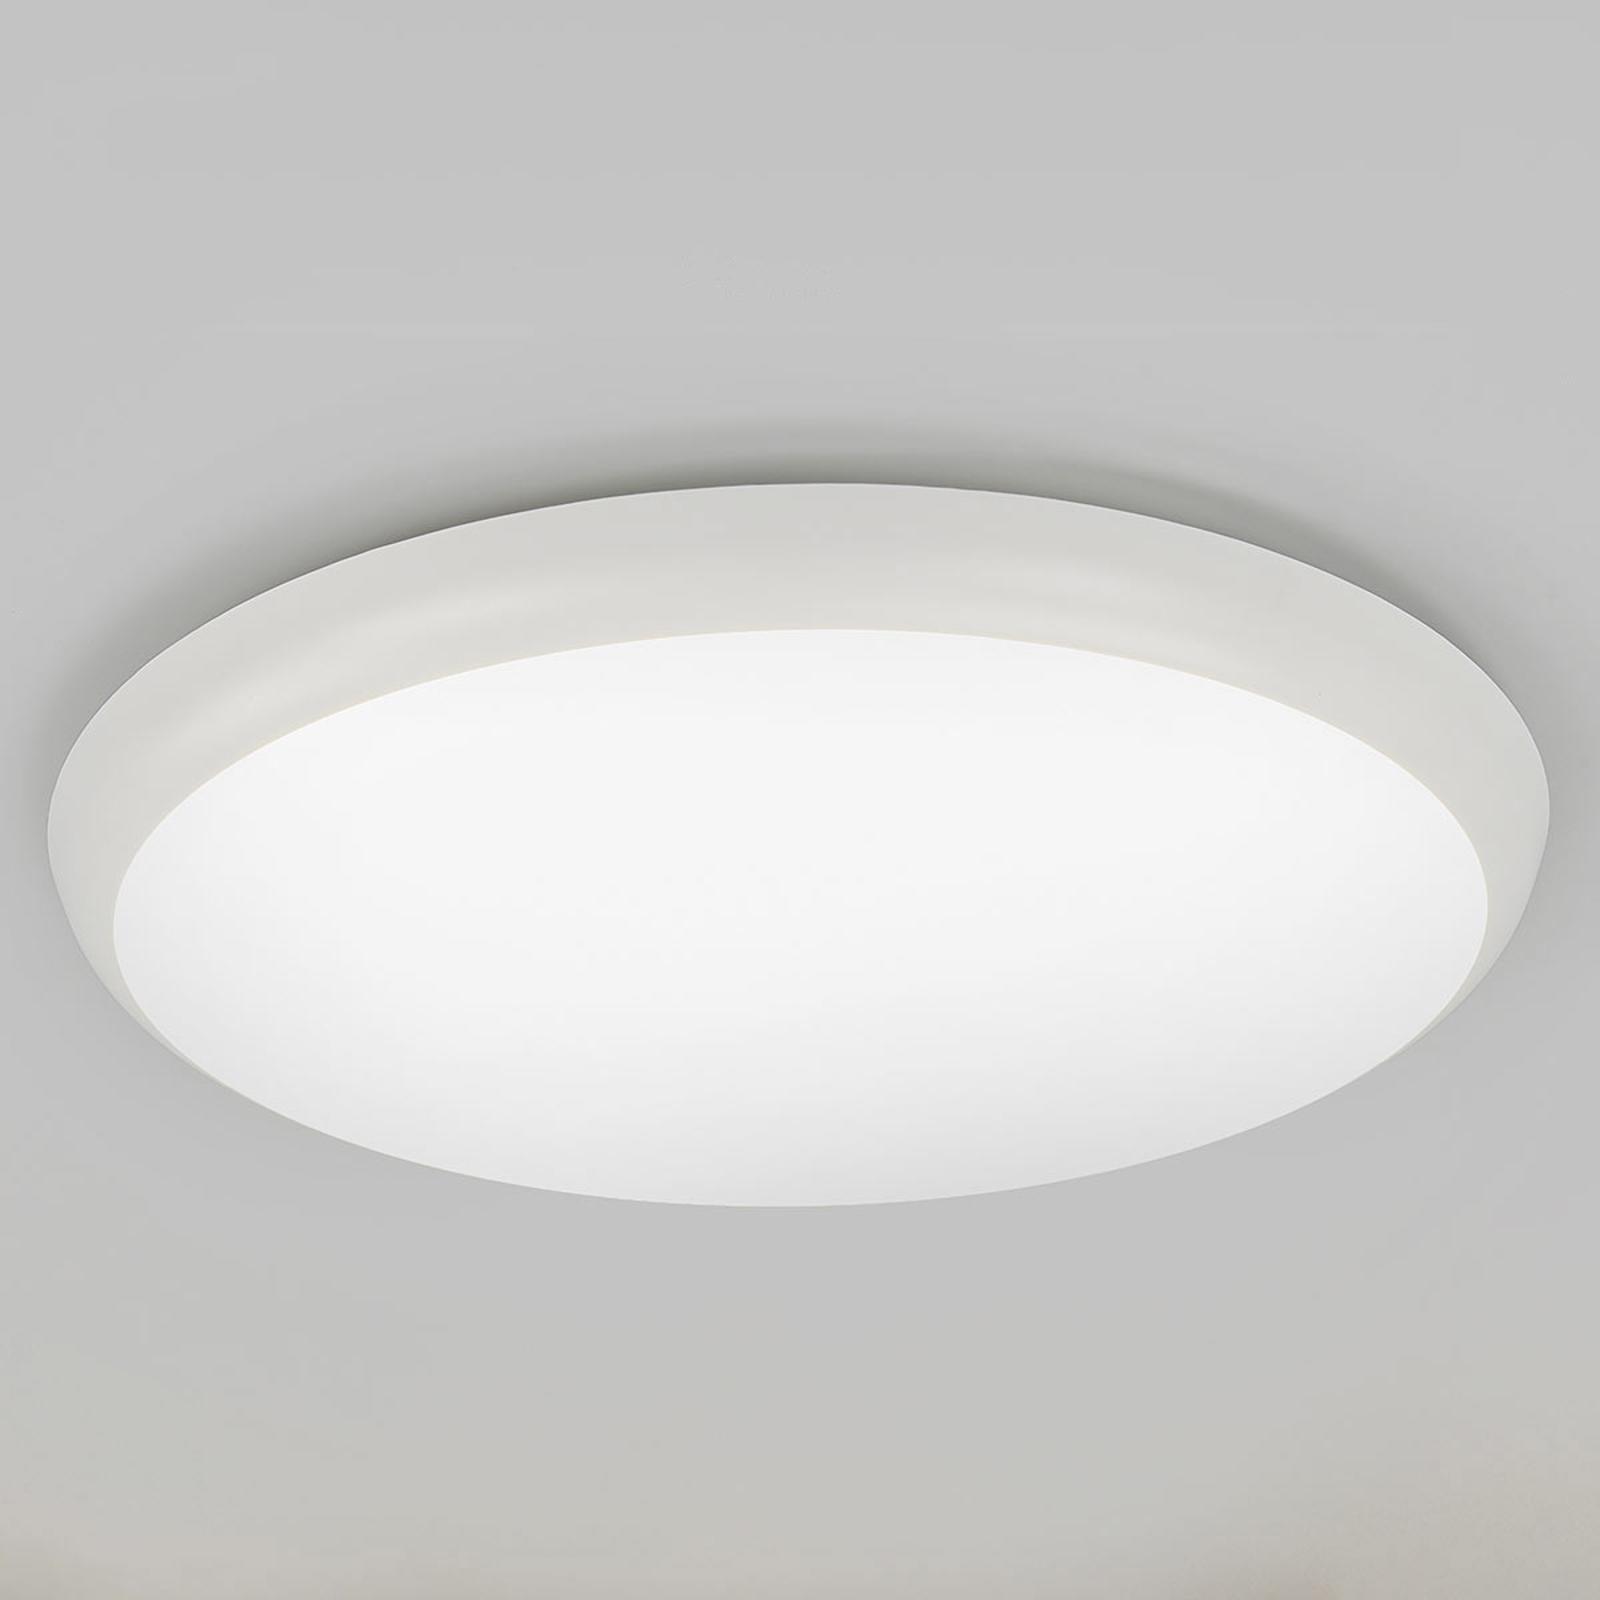 Augustin - okrągła lampa sufitowa LED, 40 cm